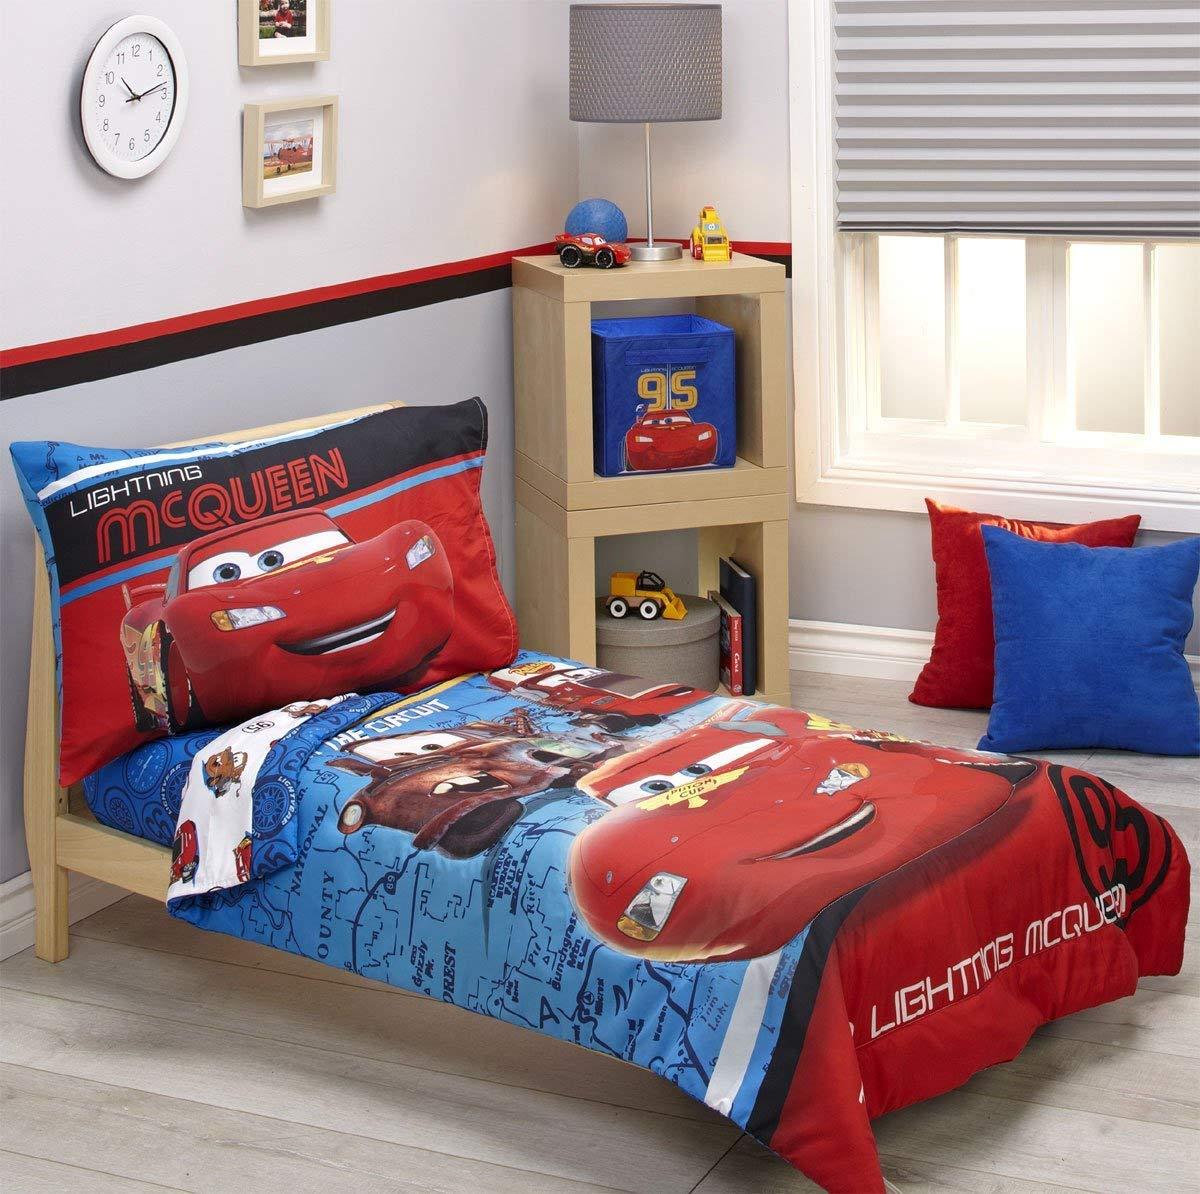 Disney Cars Team Lightening 4-Piece Toddler Bedding Set by Disney (Image #1)